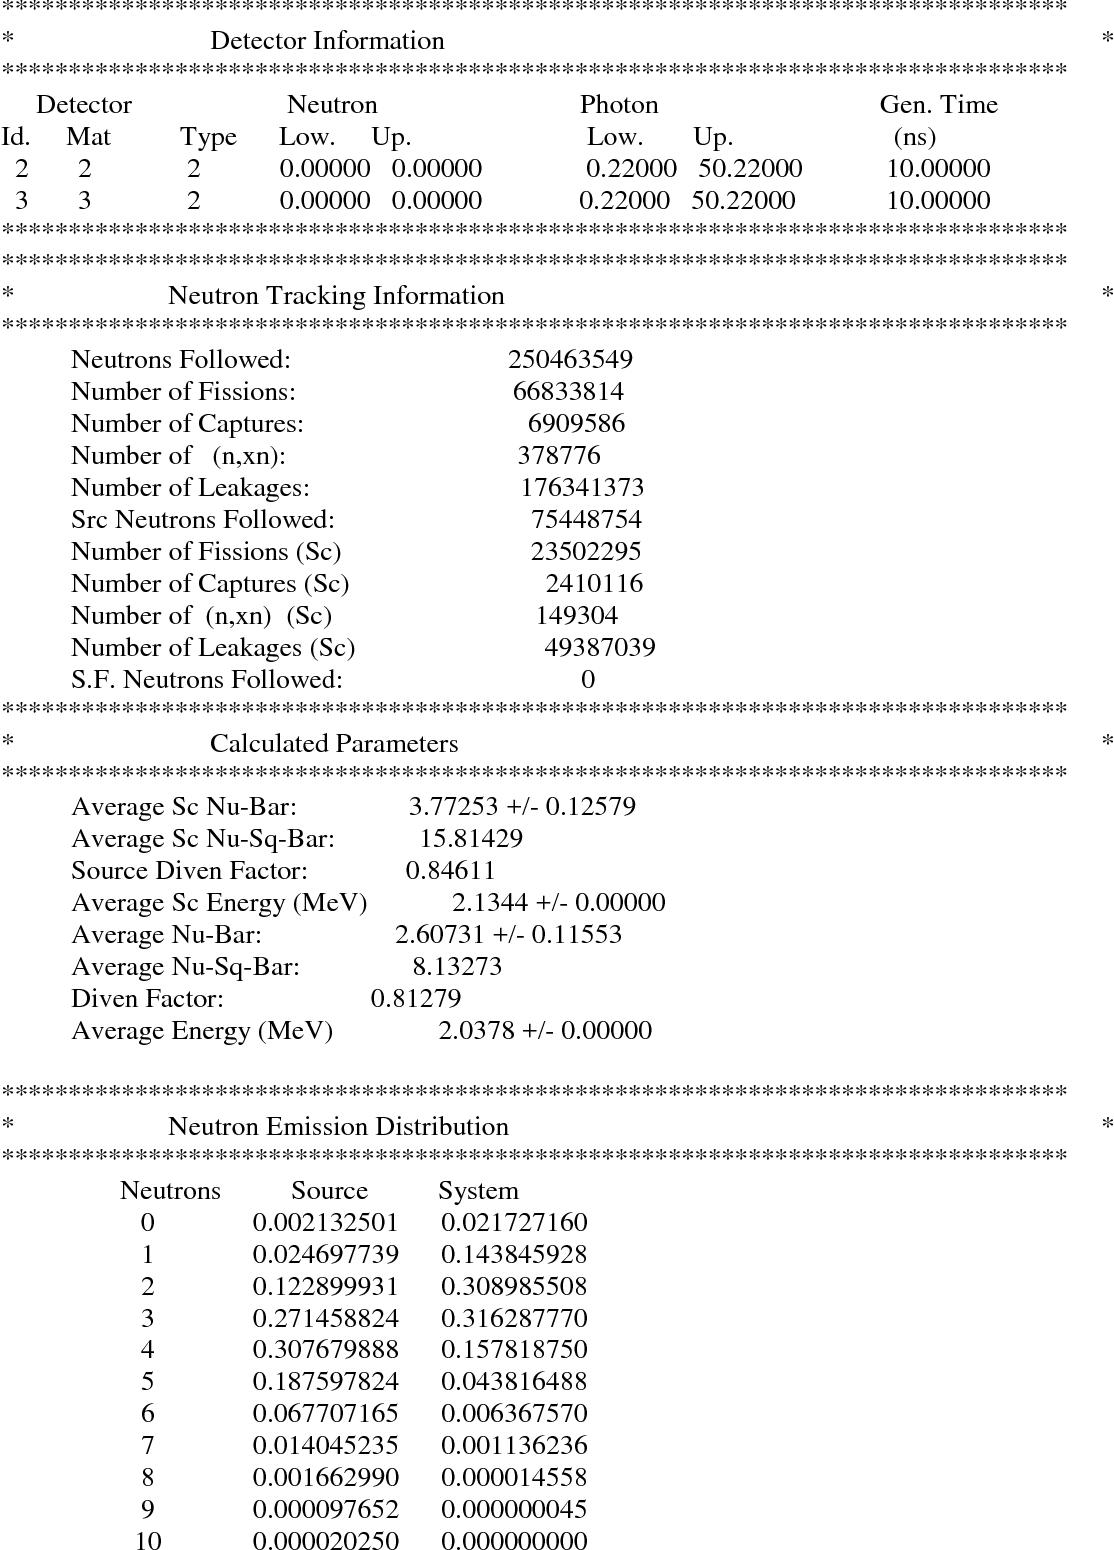 PDF] MCNP-DSP users manual - Semantic Scholar